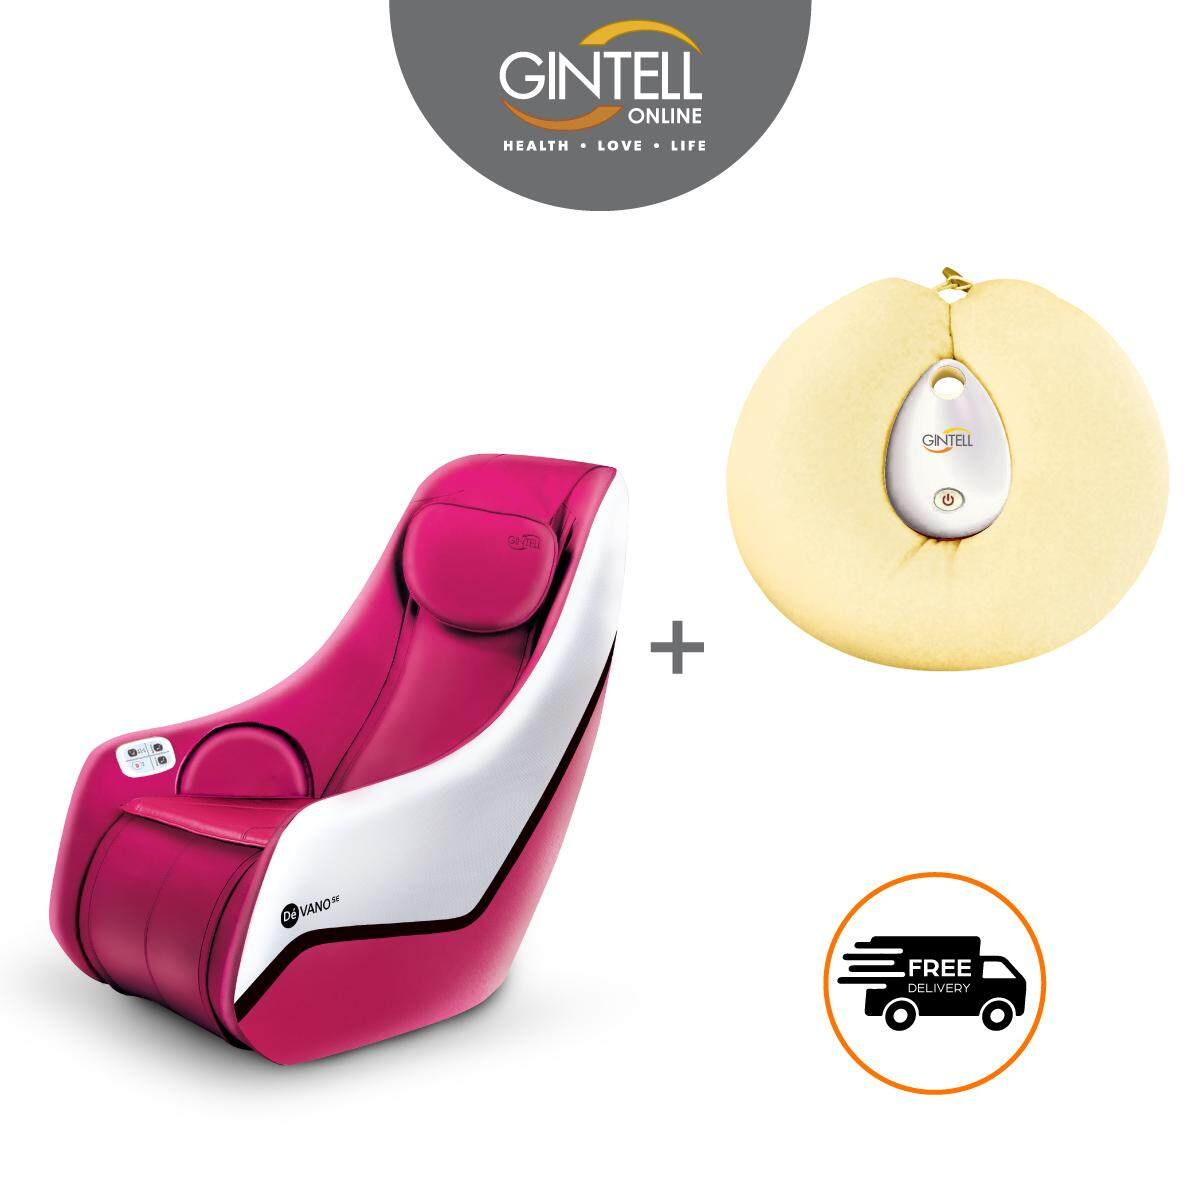 GINTELL DVano SE Purple Pink Massage Chair + Magic Pillow (Cream Colour)